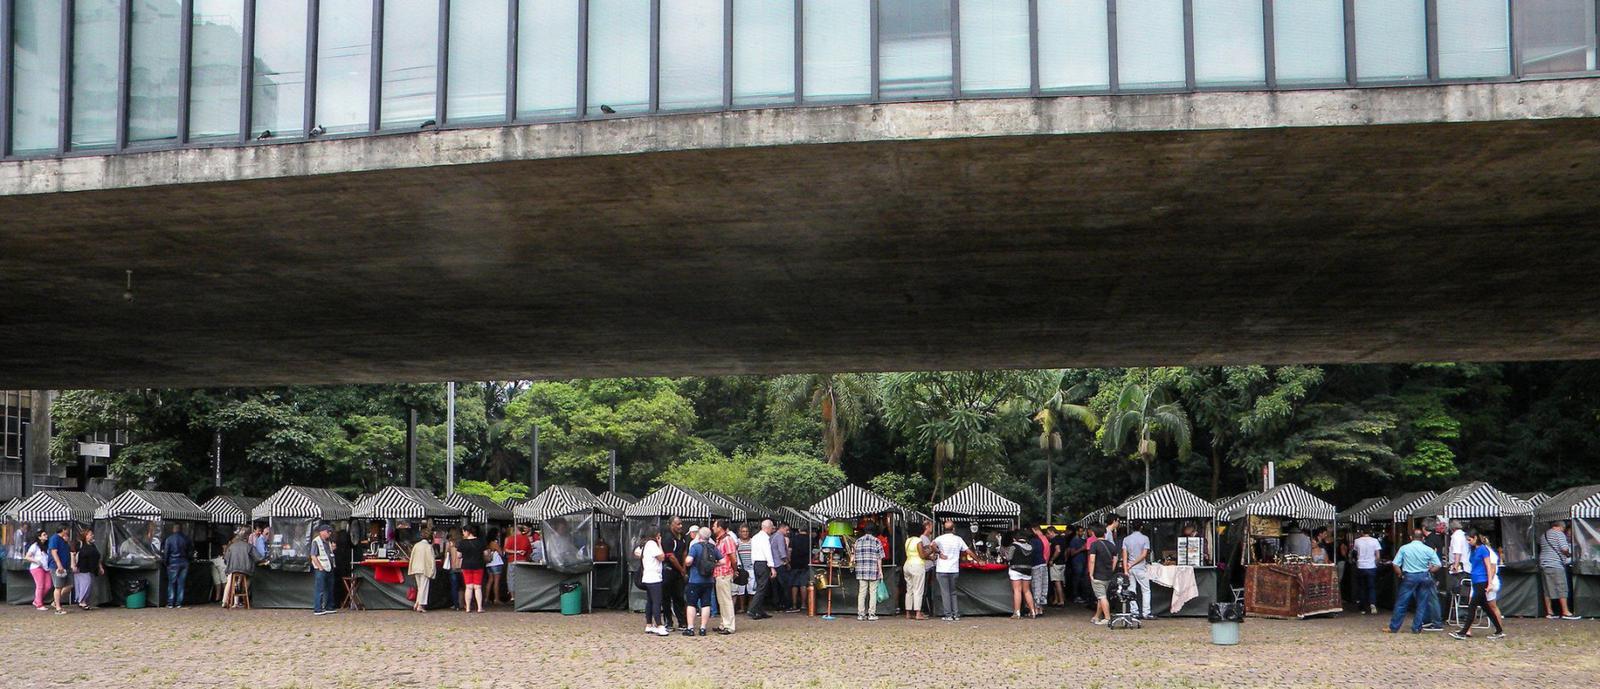 Arts and crafts market at MASP